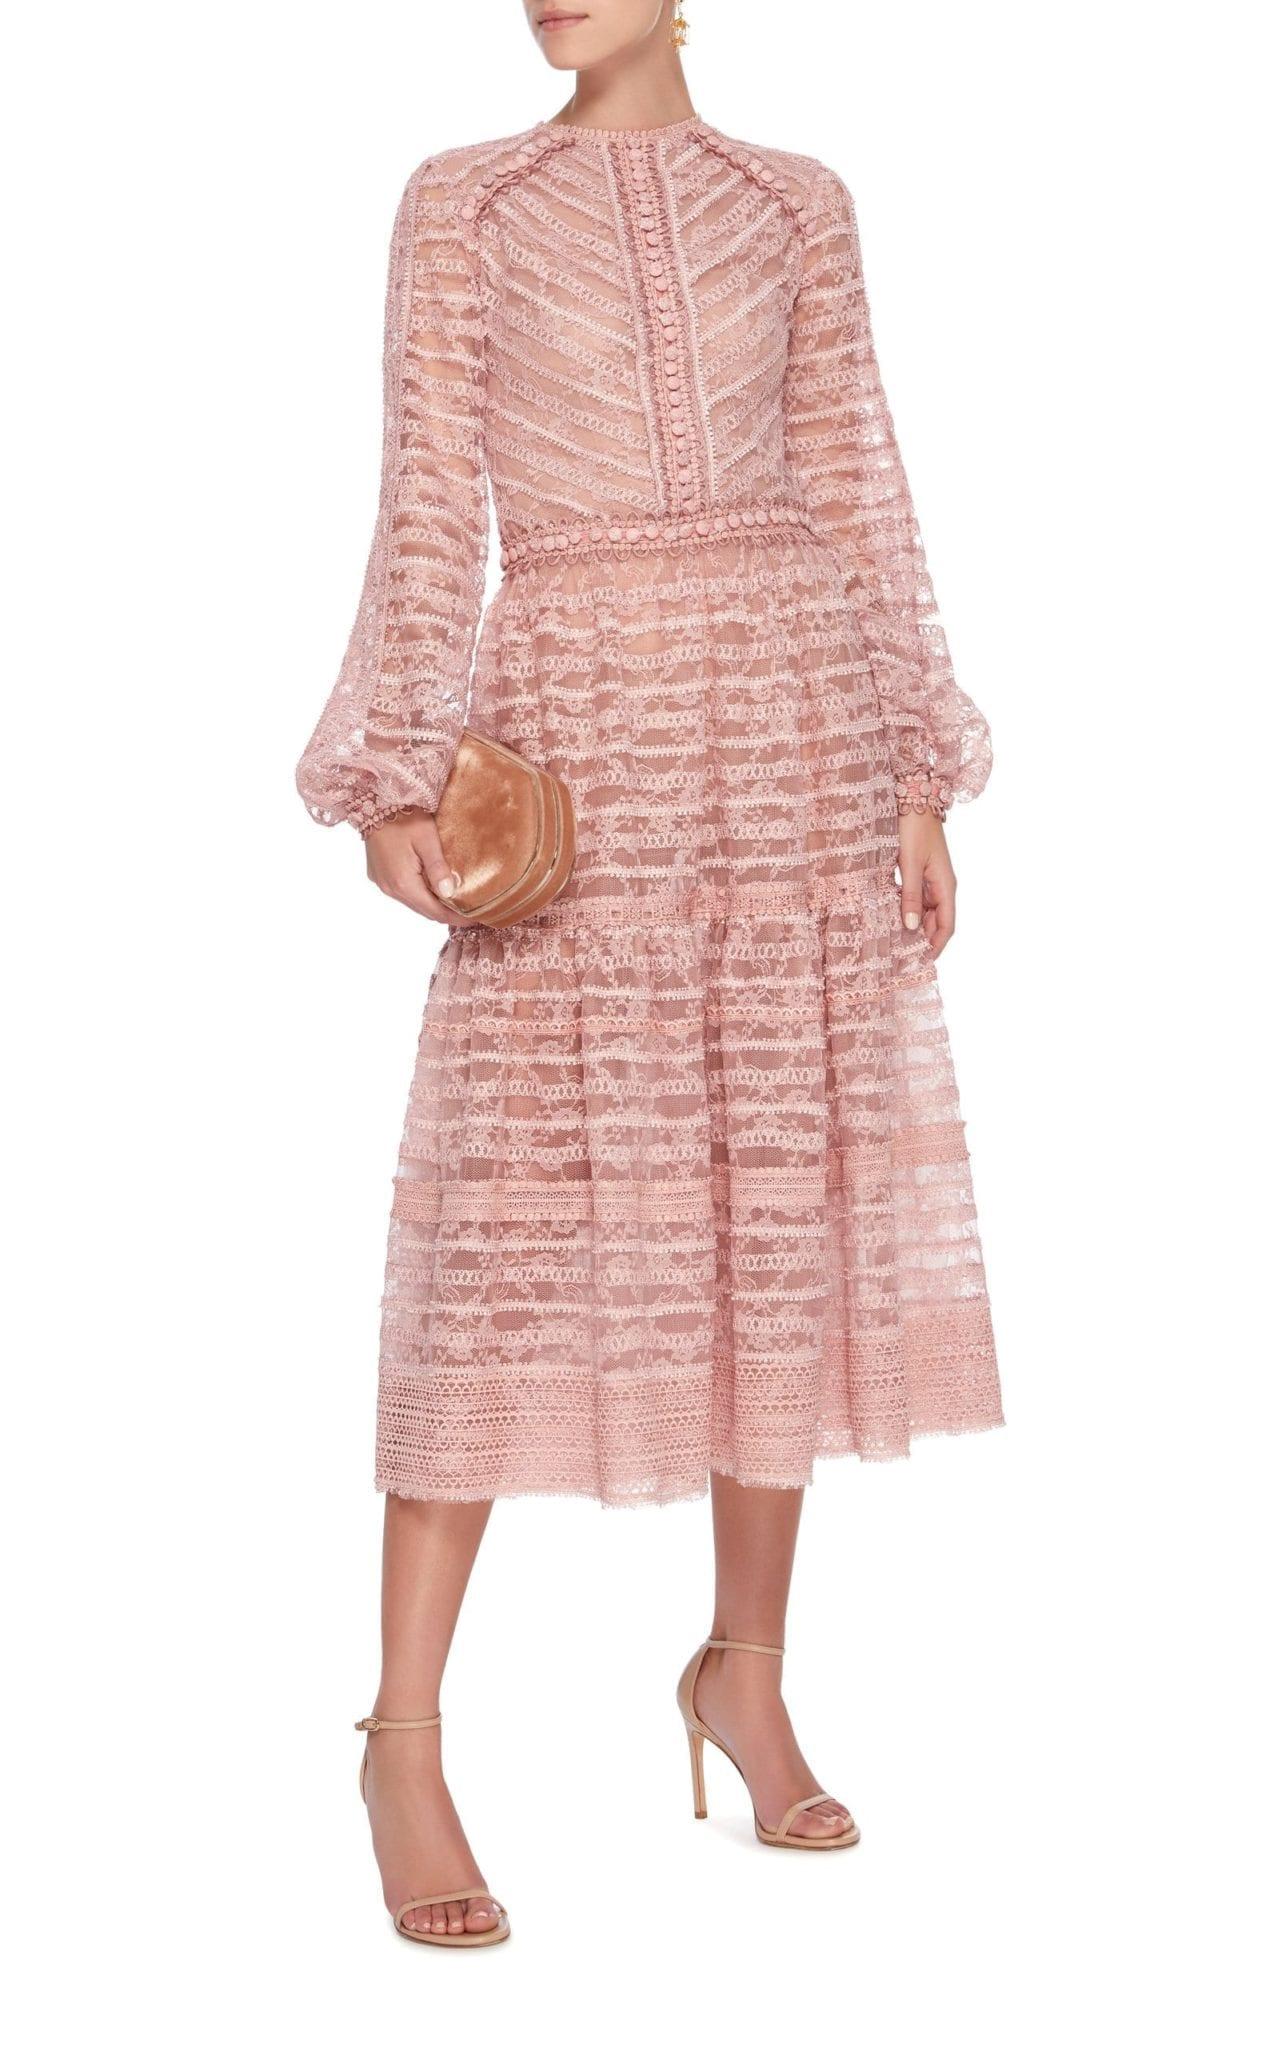 7b16555553e COSTARELLOS Cordone Lace Midi Pink Dress - We Select Dresses